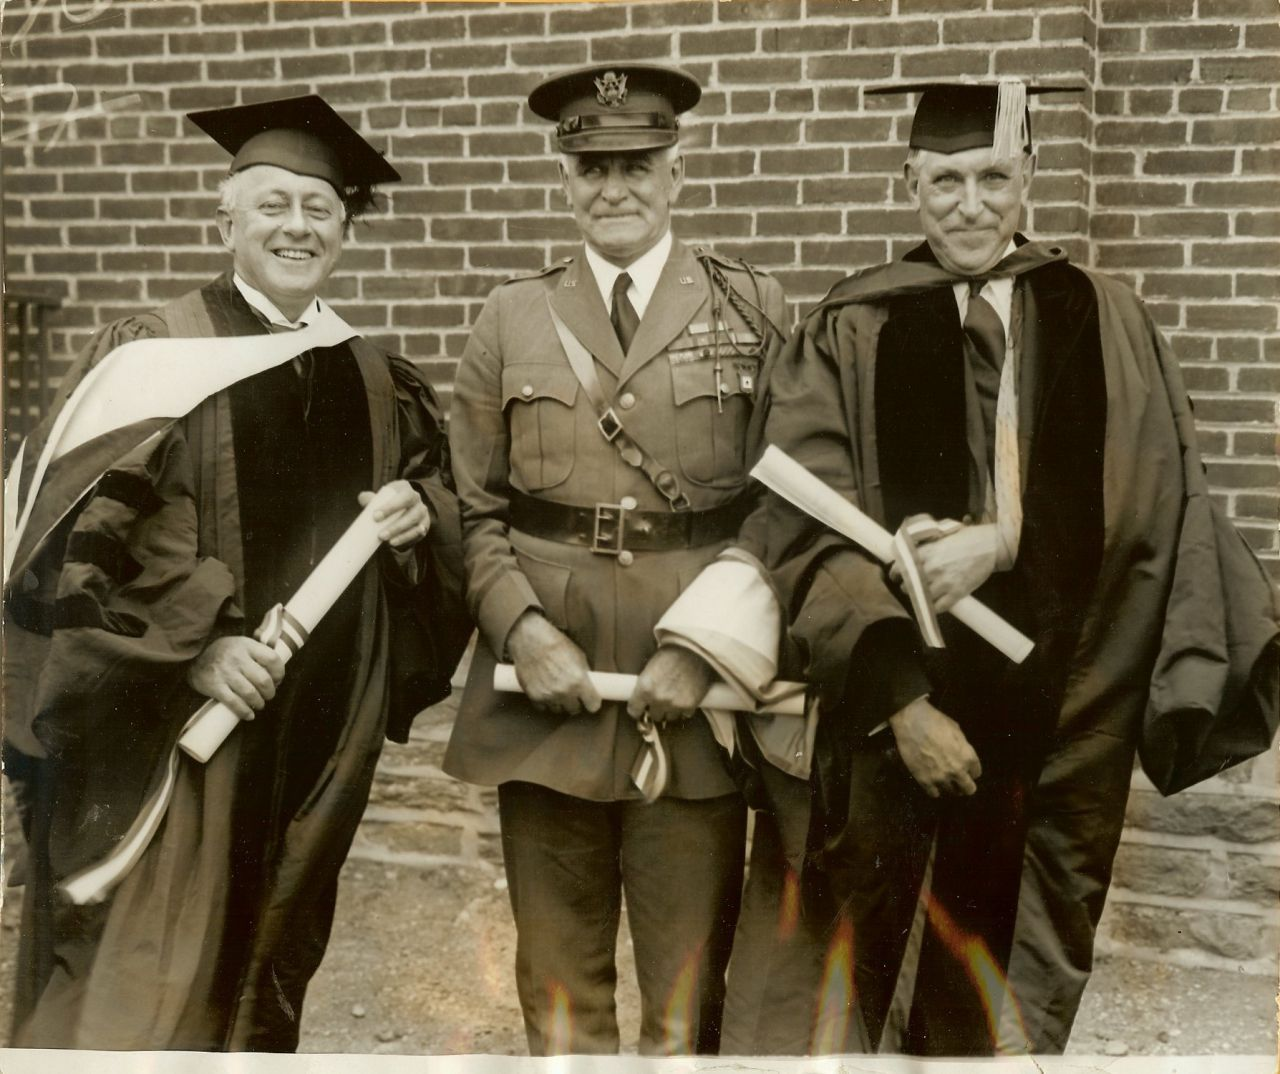 Vintage Cecil B. DeMILLE War HERO Hanson E. ELY Photo